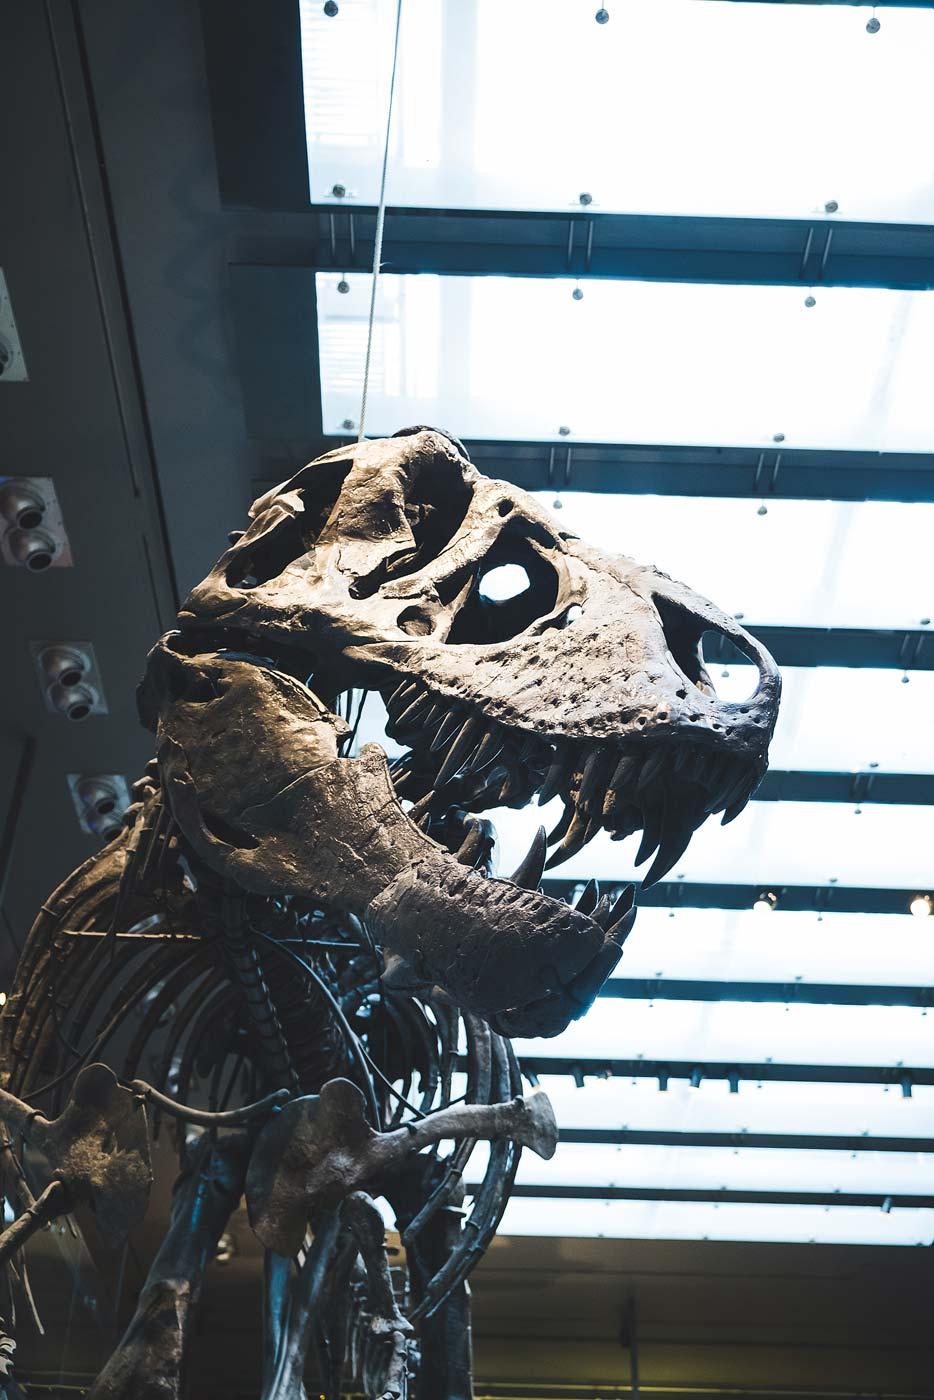 sNatural-History-Museum---Feb-2017-85.jpg